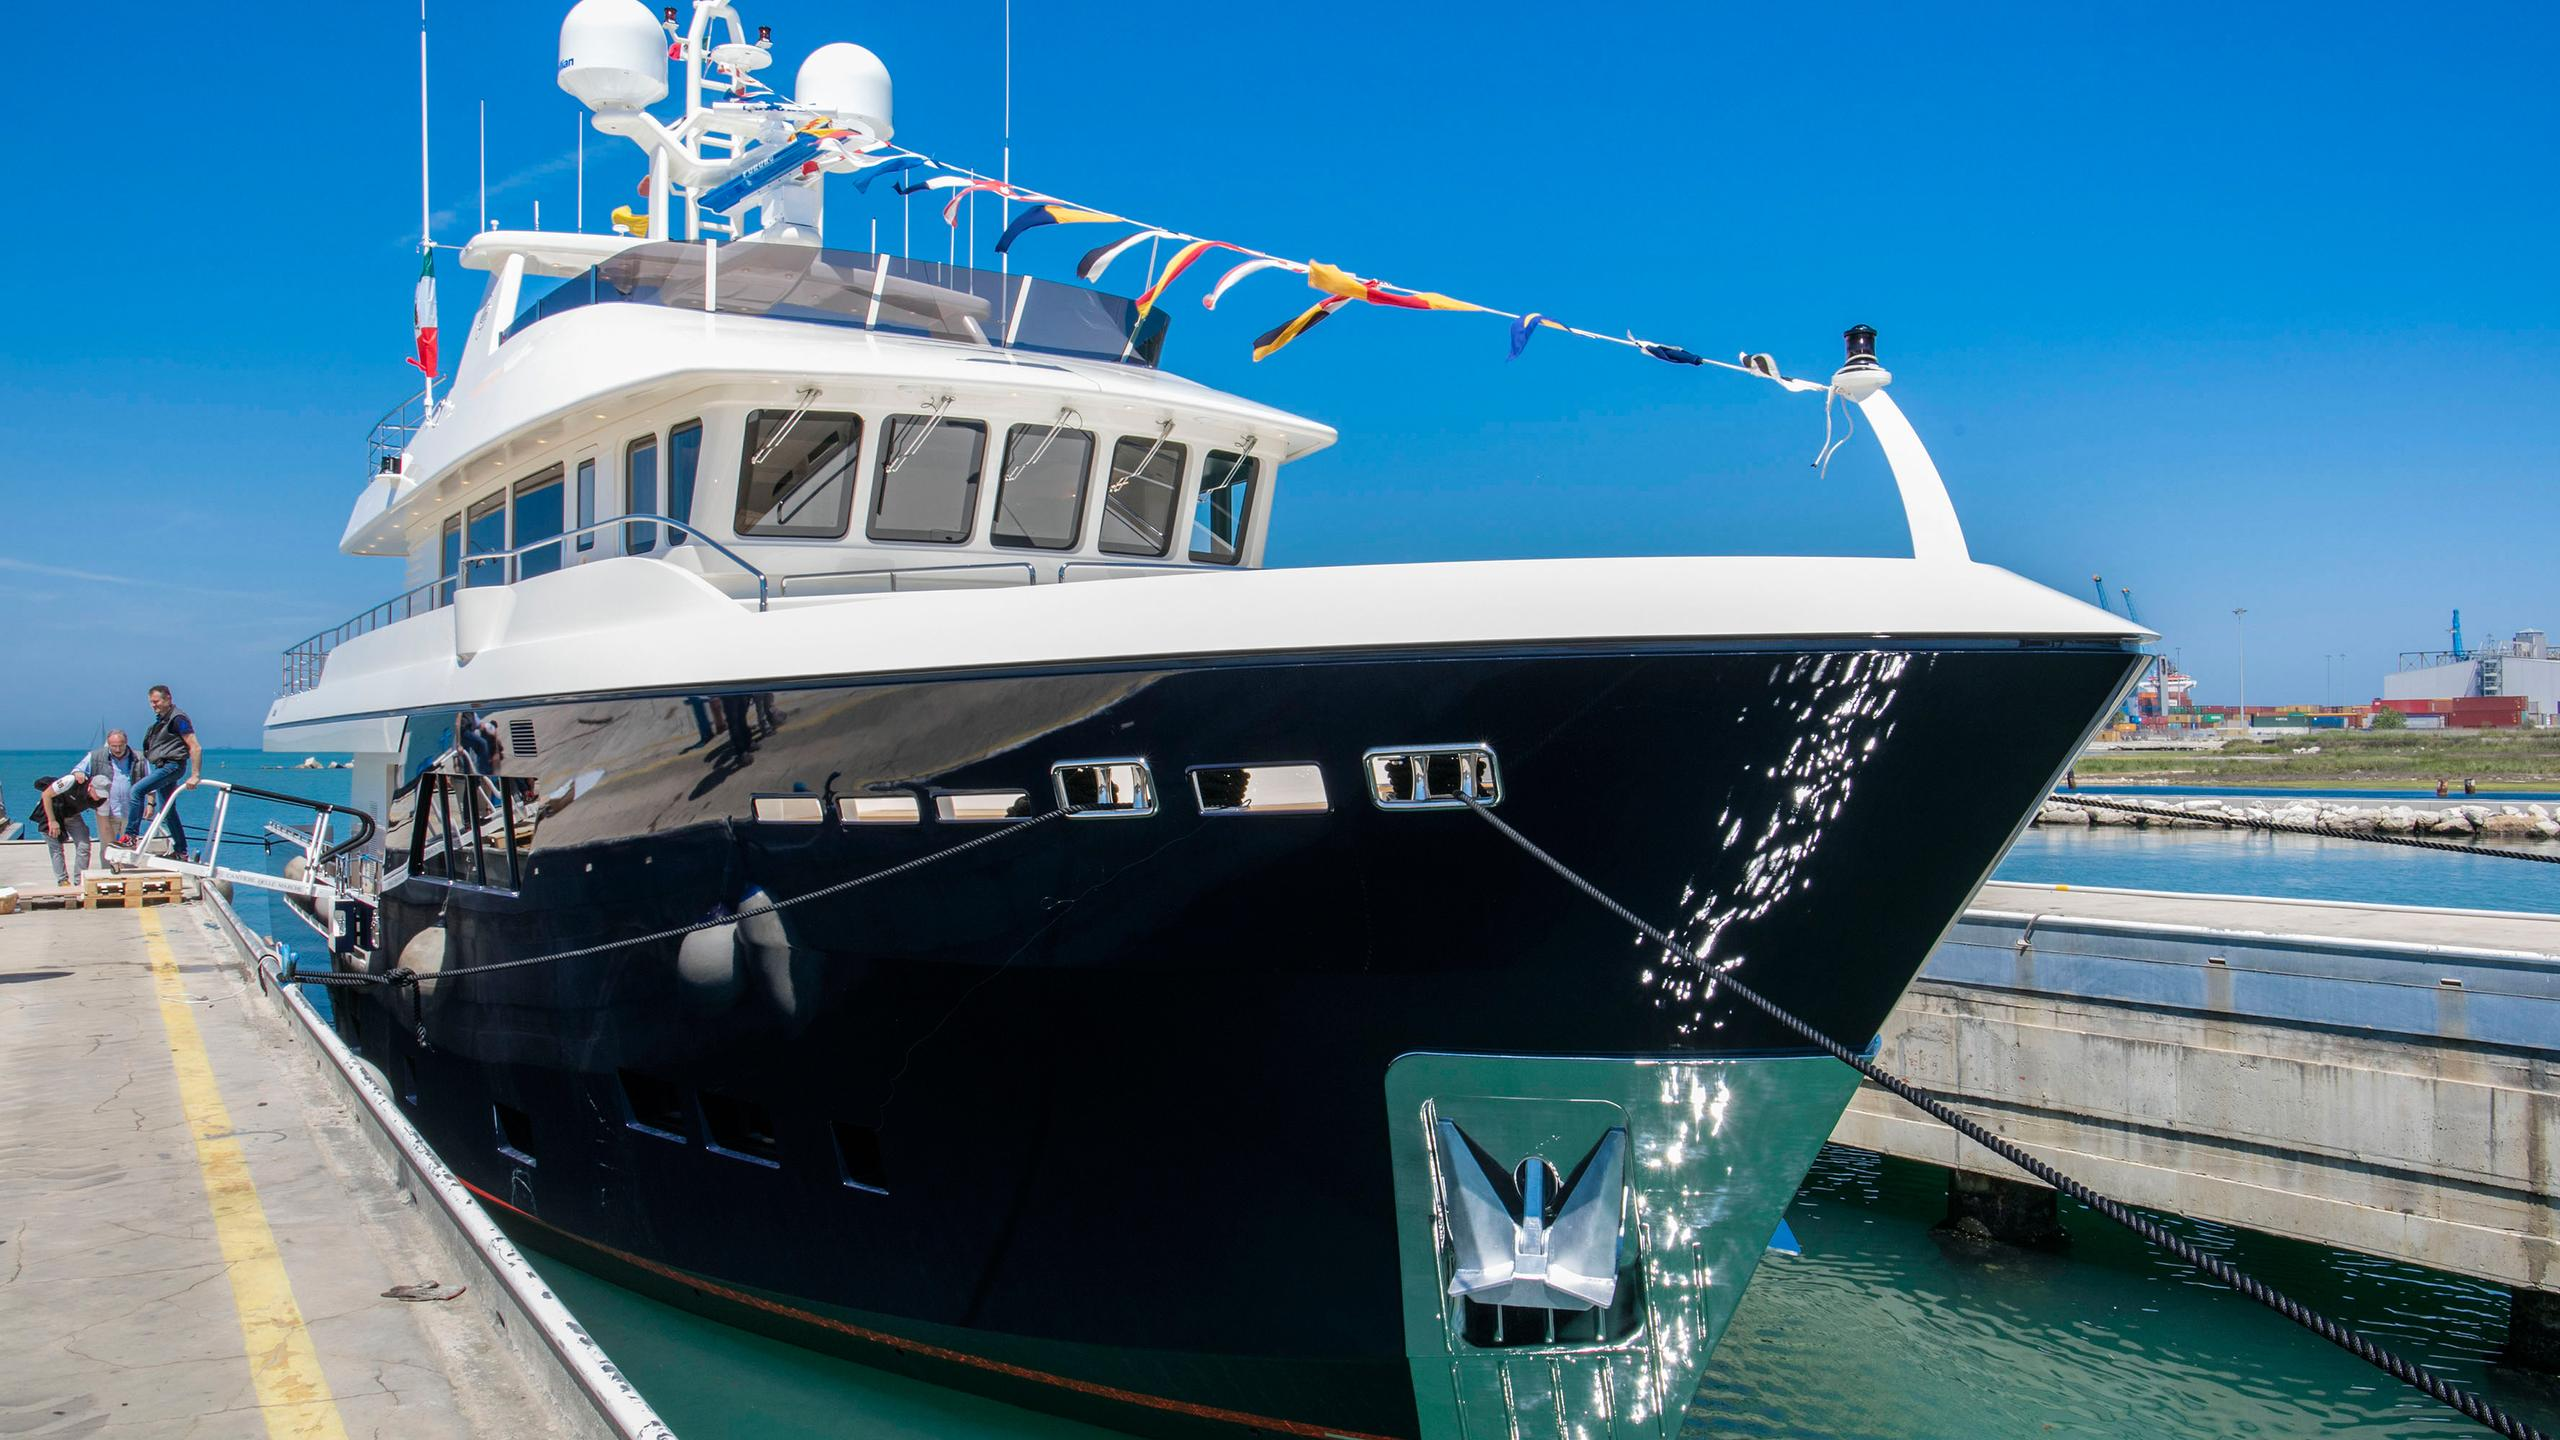 babbo-motor-yacht-cantiere-delle-marche-darwin-102-2016-31m-bow